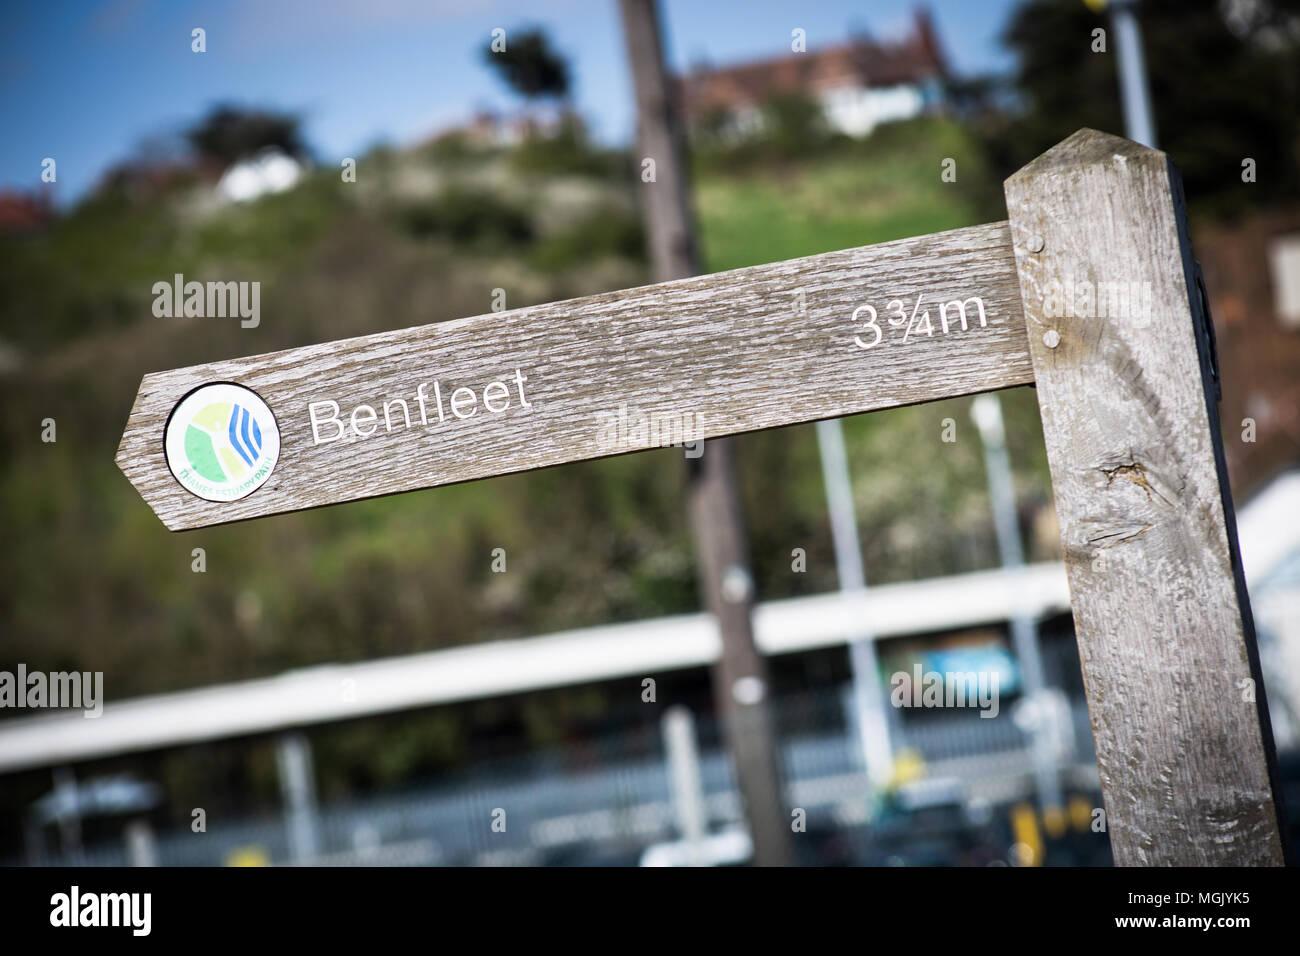 BENFLEET, UK – APRIL 3, 2017: closeup photo of a wooden sign pointing to Benfleet, Essex, UK Stock Photo